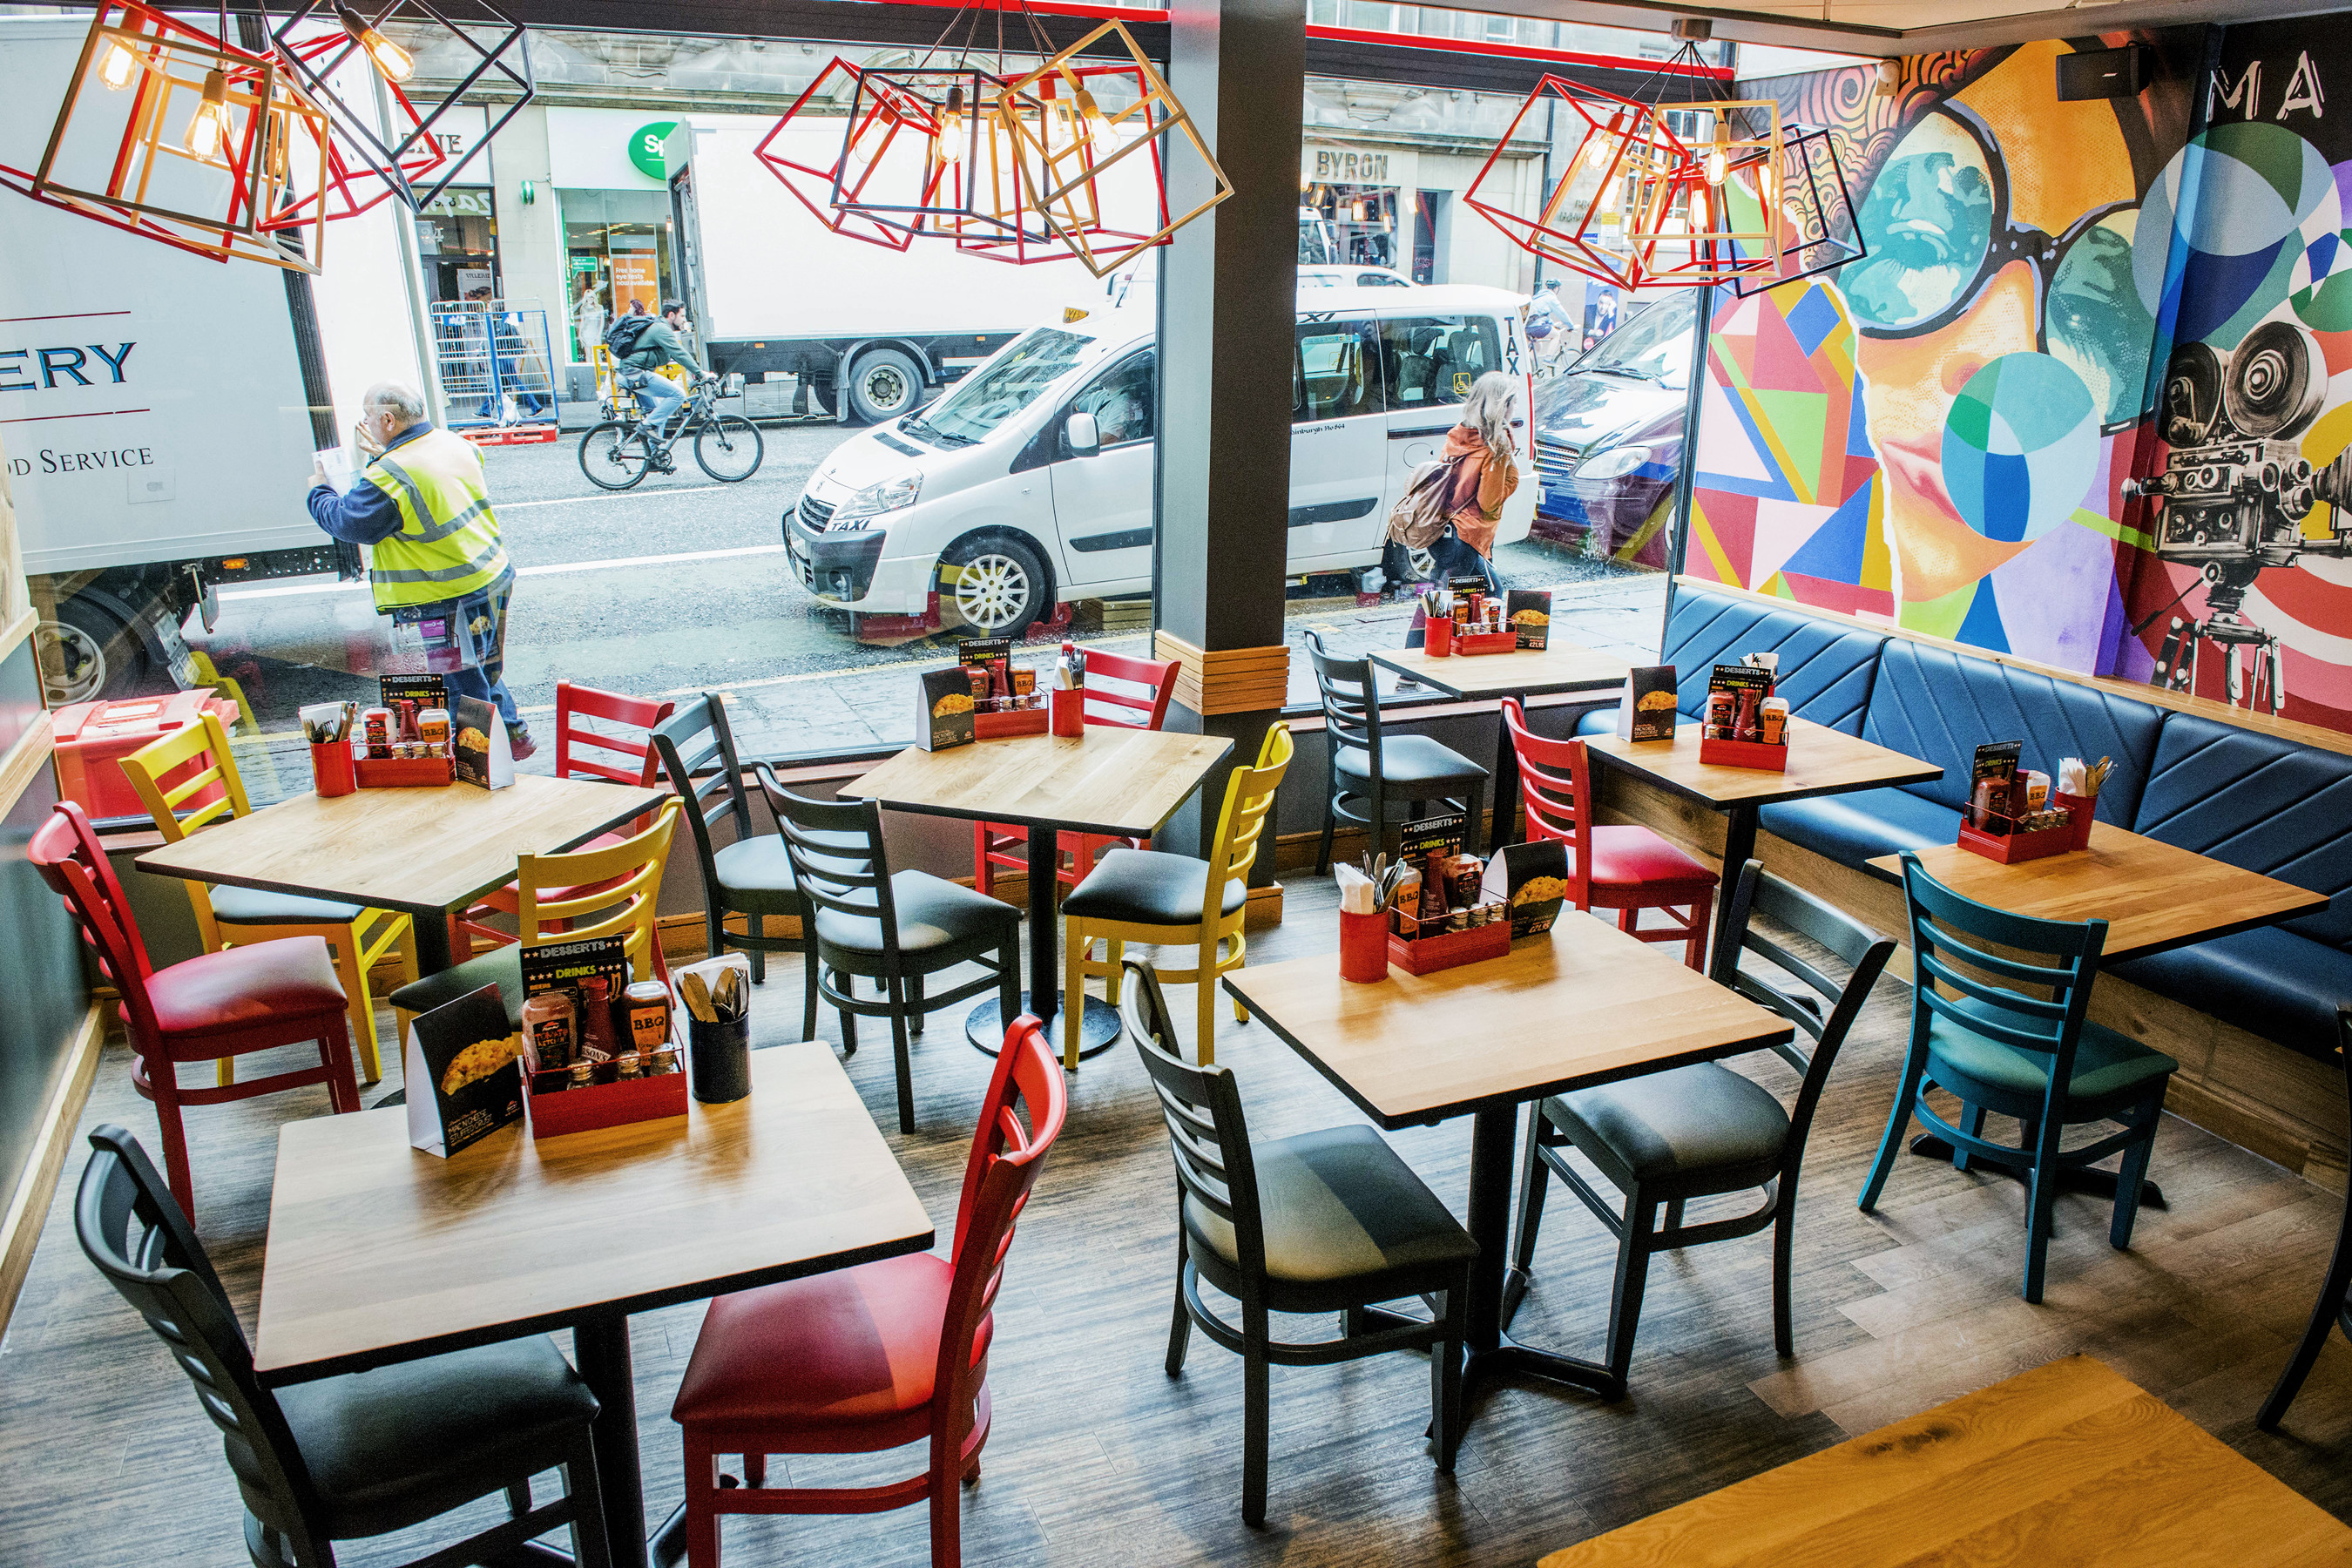 20 New Jobs At Pizza Hut The Edinburgh Reporter